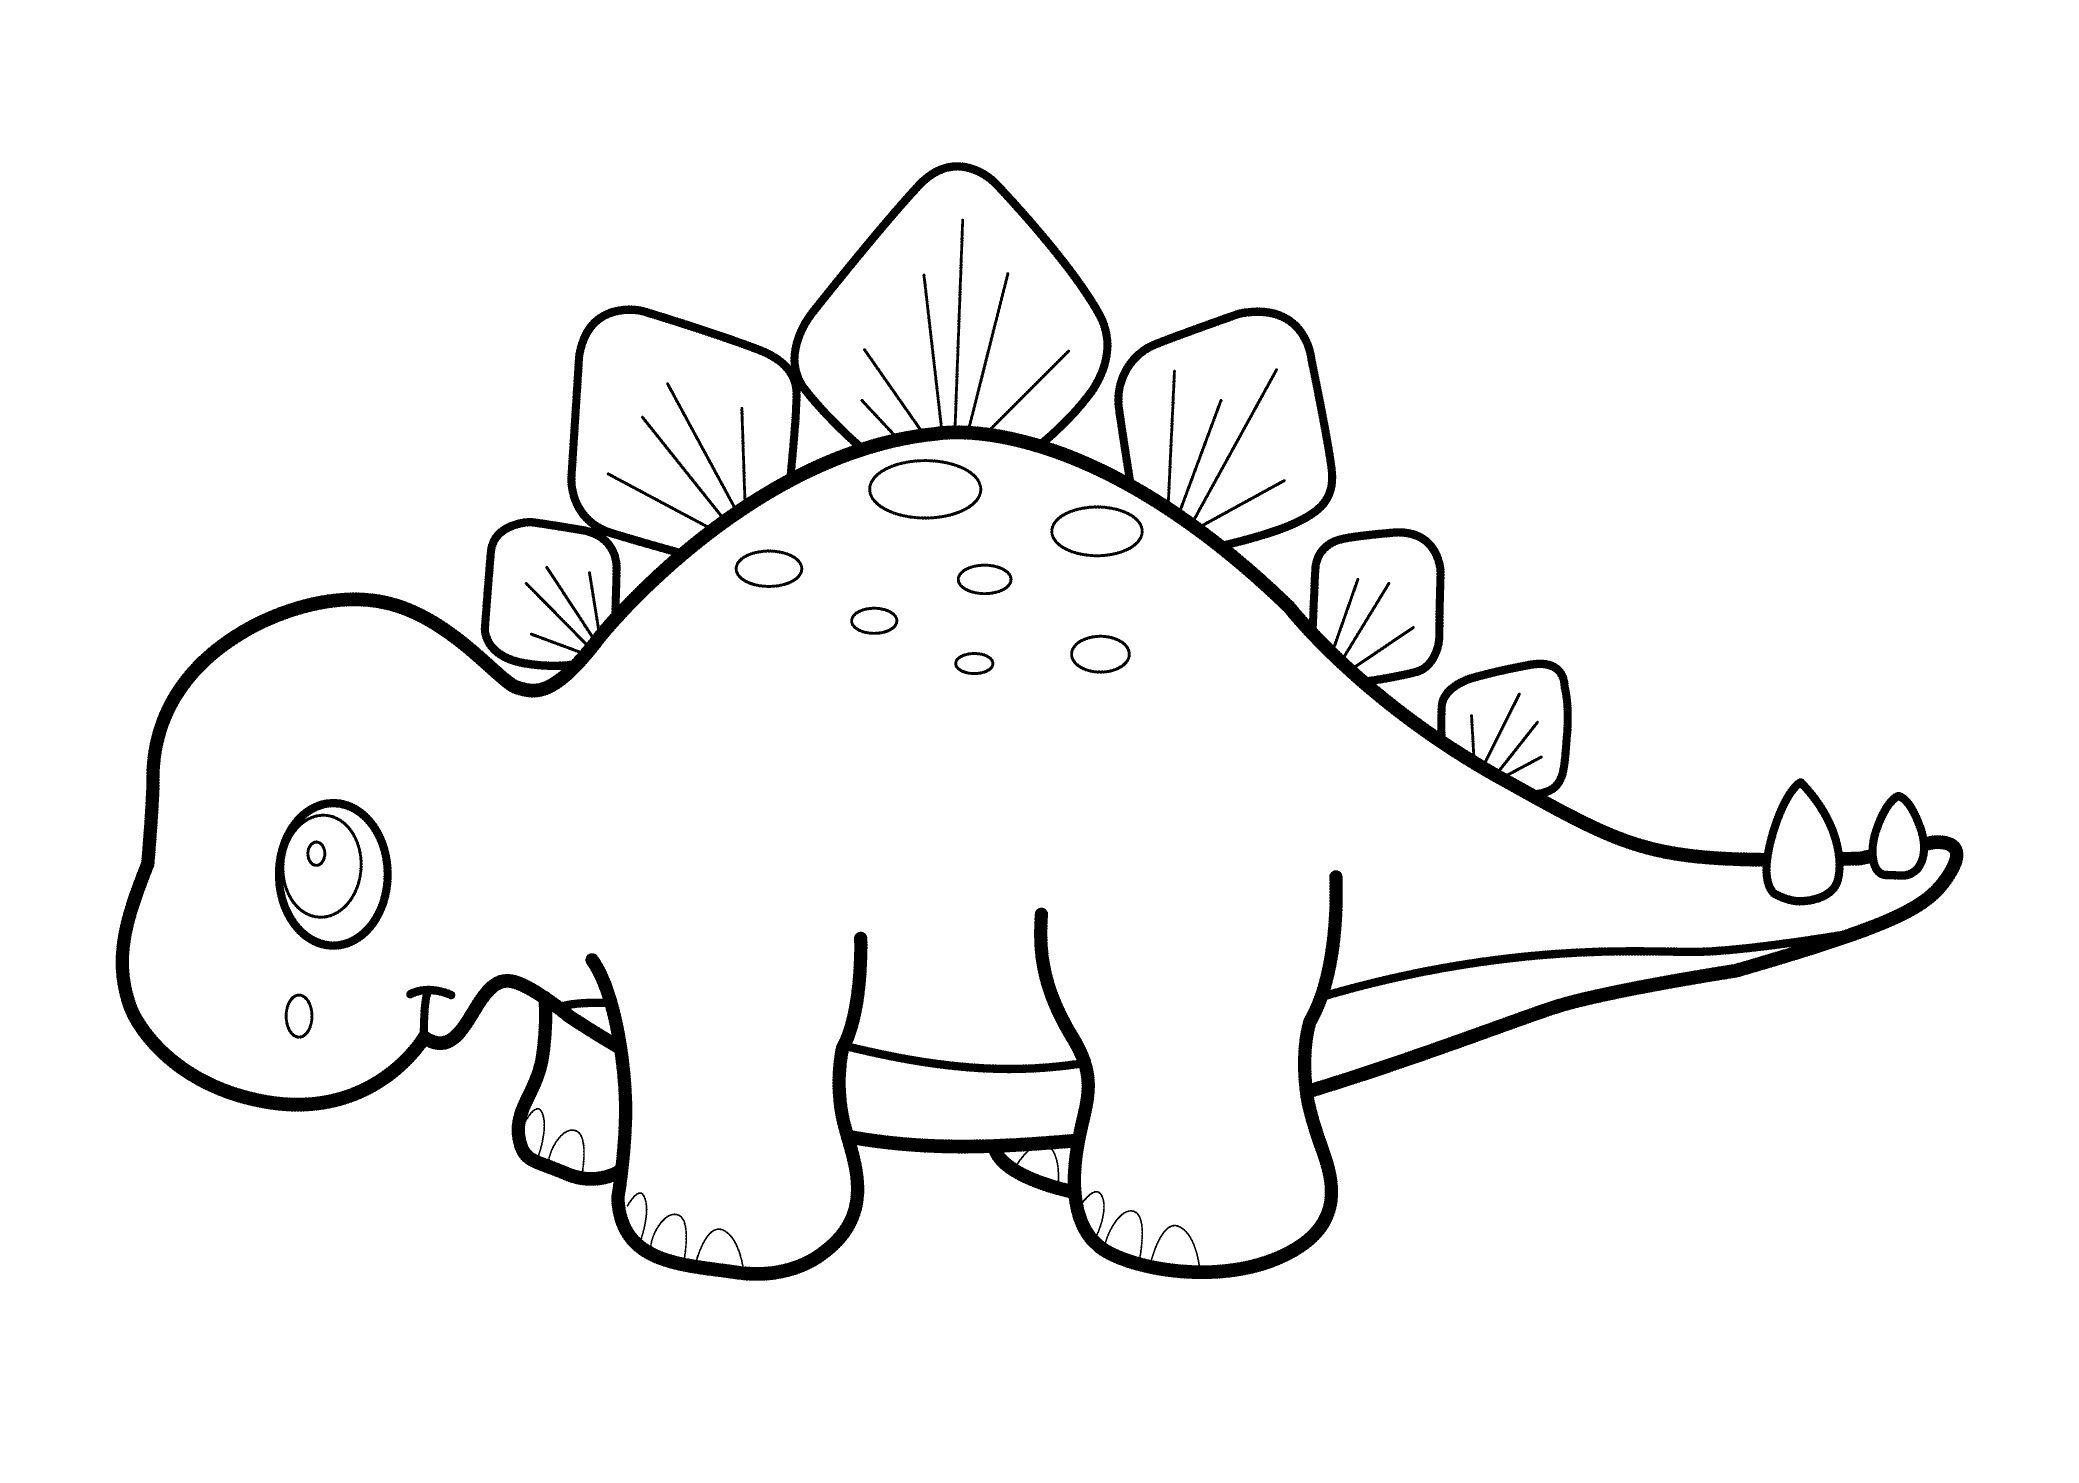 Printable Stegosaurus Dinosaur Coloring Pages K5